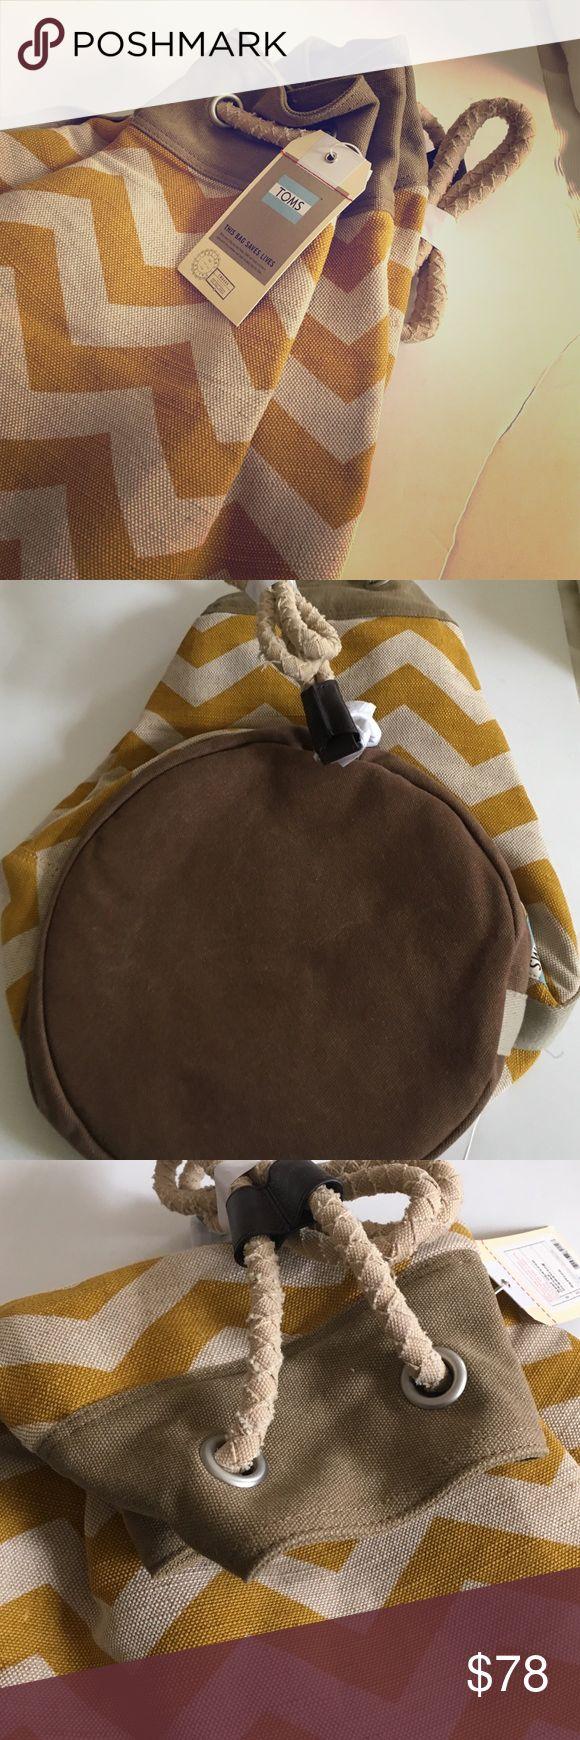 Toms Drawstring Bag Adorable drawstring bag in saffron Chevron TOMS Bags